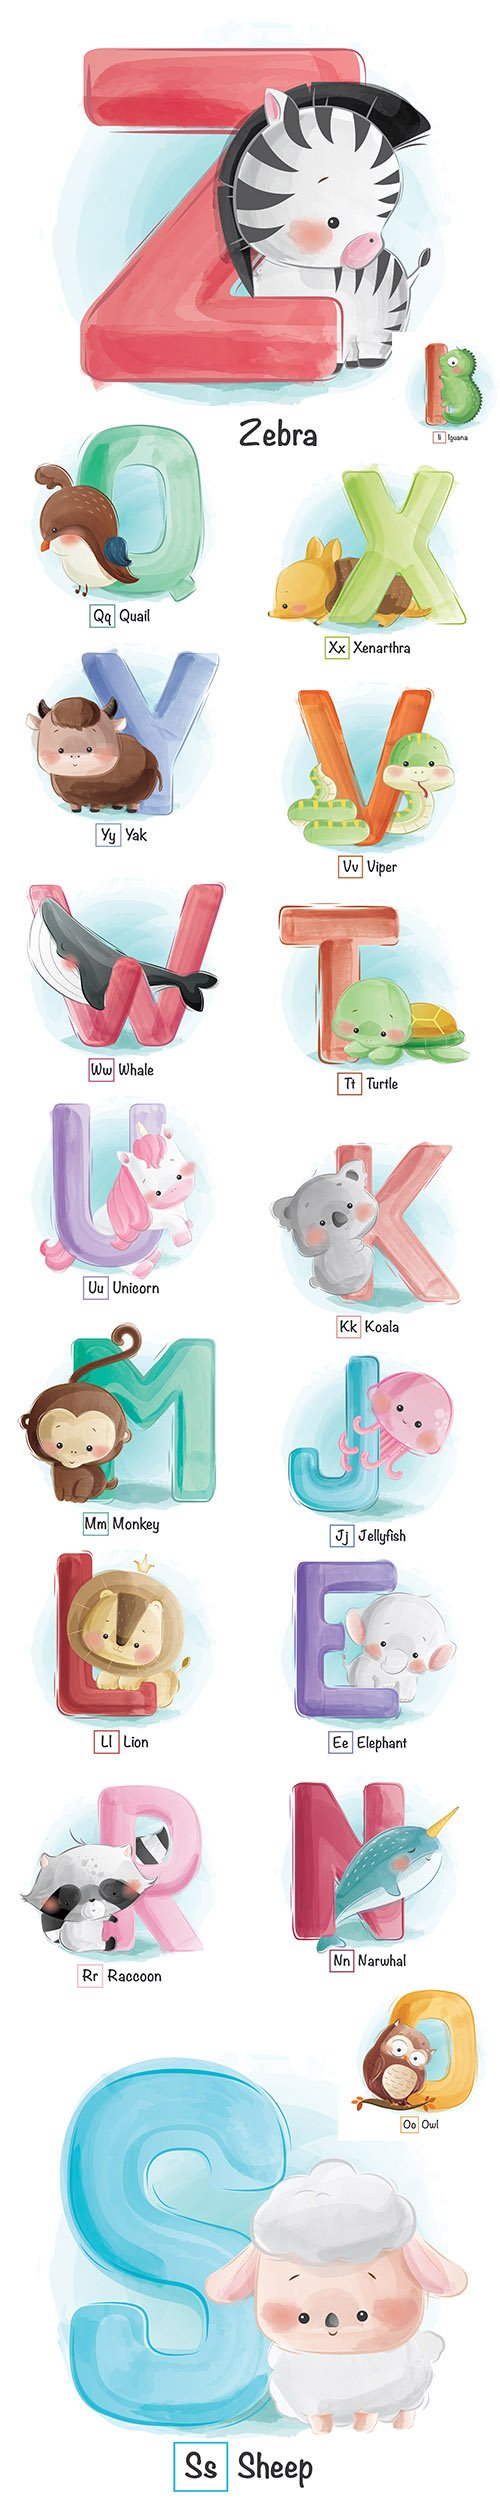 Alphabet with Funny Animal Premium Illustrations Set